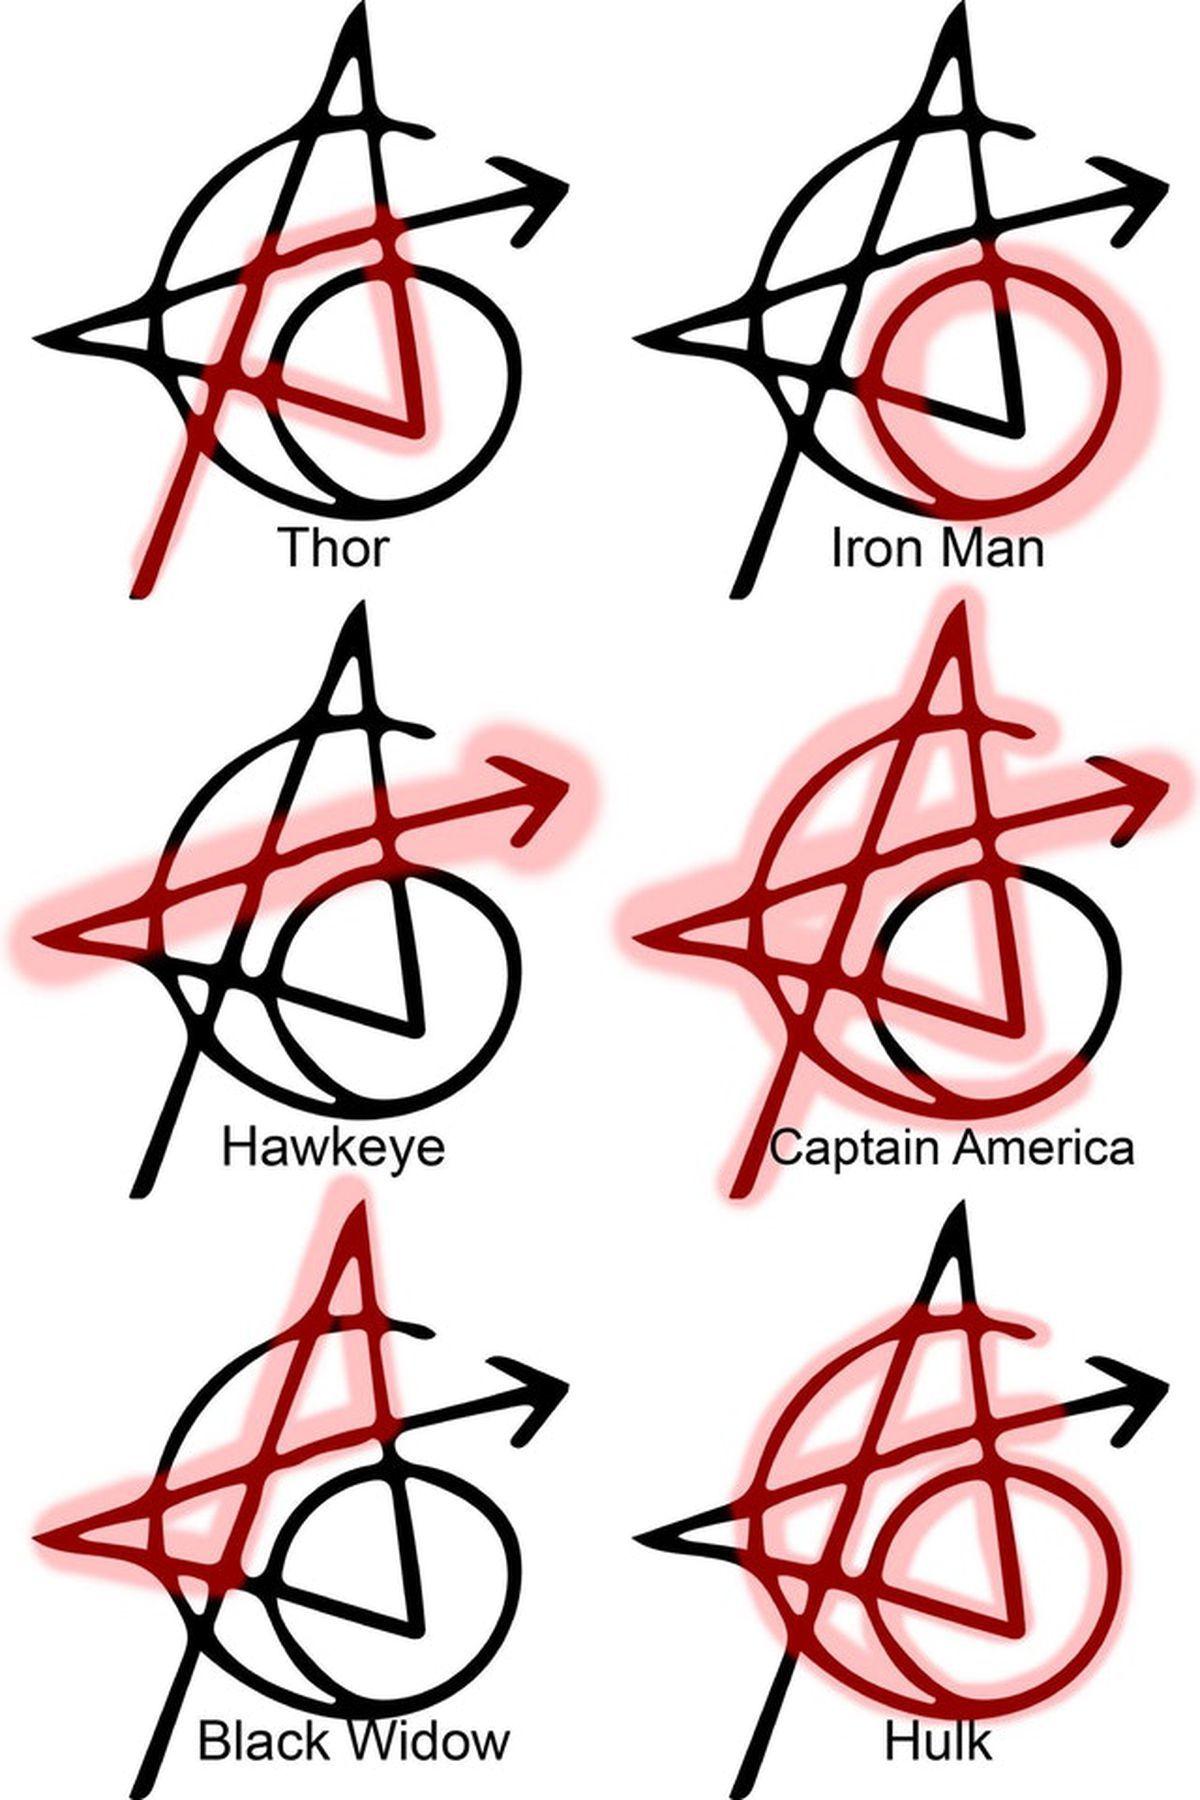 Pin By Marvel Trash On Yep Pinterest Avengers And Iron Man Circuit Superhros Comics Logostore Cast Dc Fan Spiderman